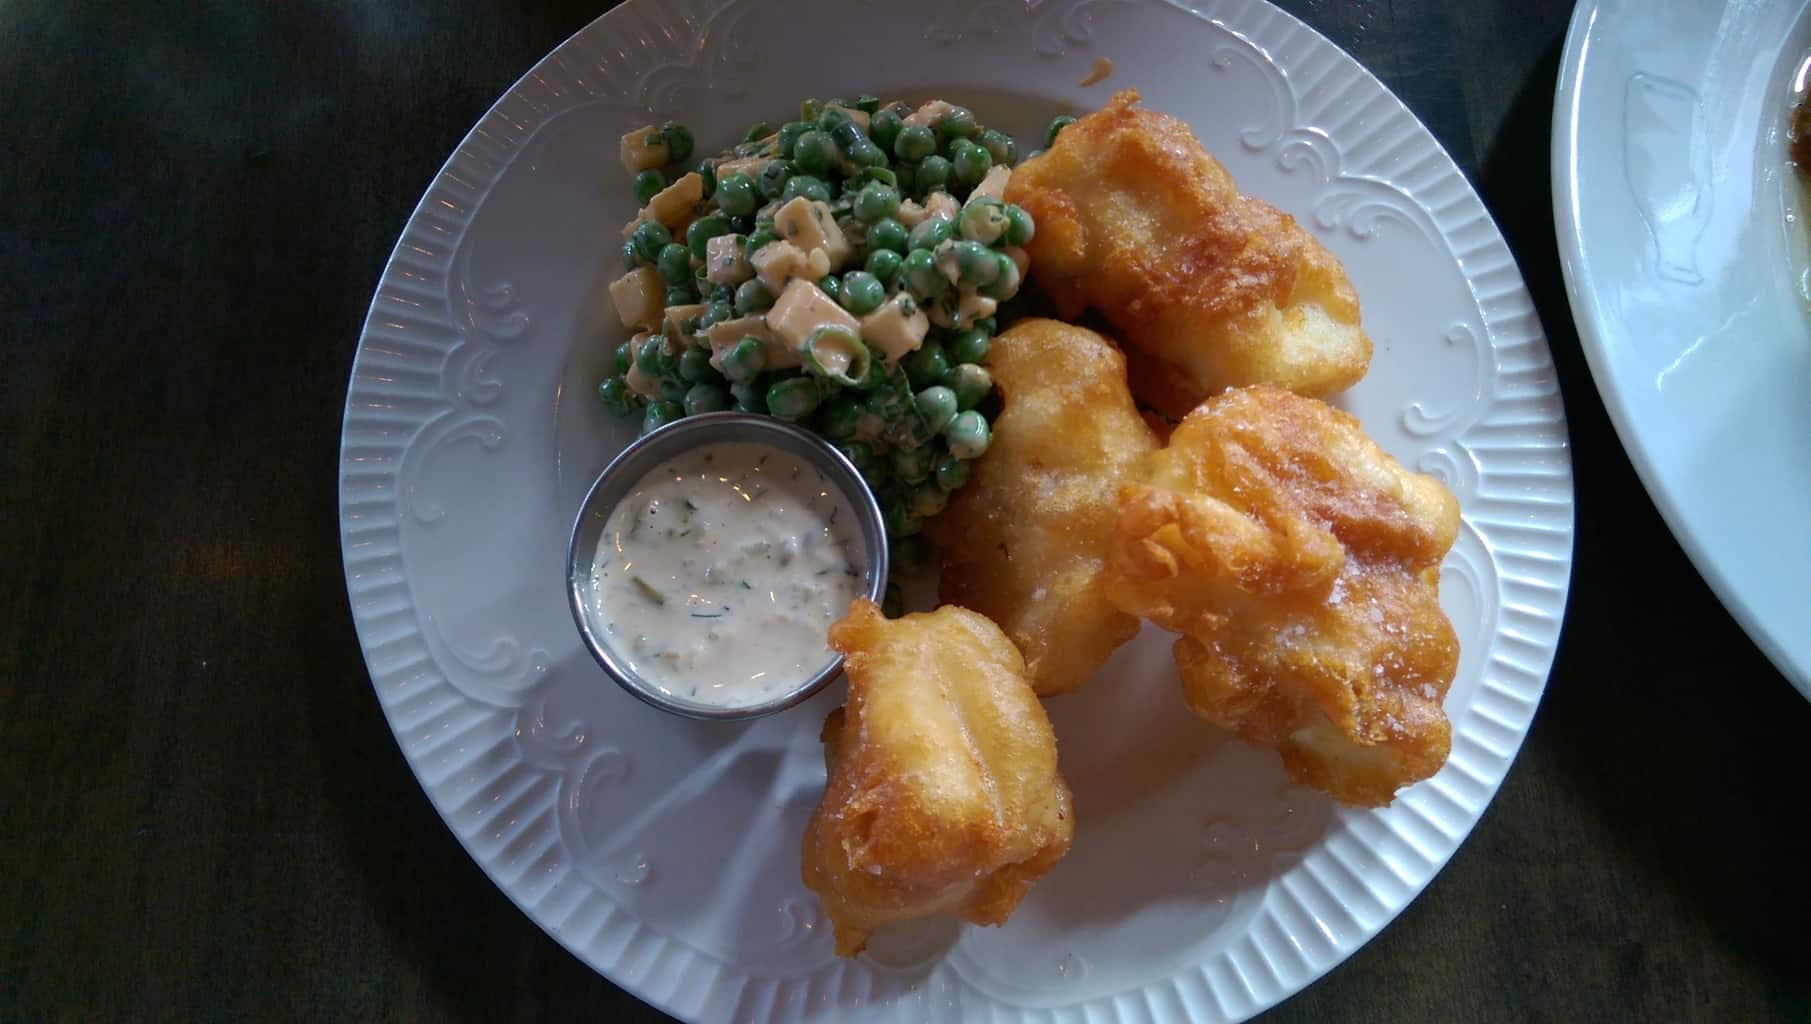 beer battered fish with tartar sauce; peas salad, cheddar and thousand island sauce